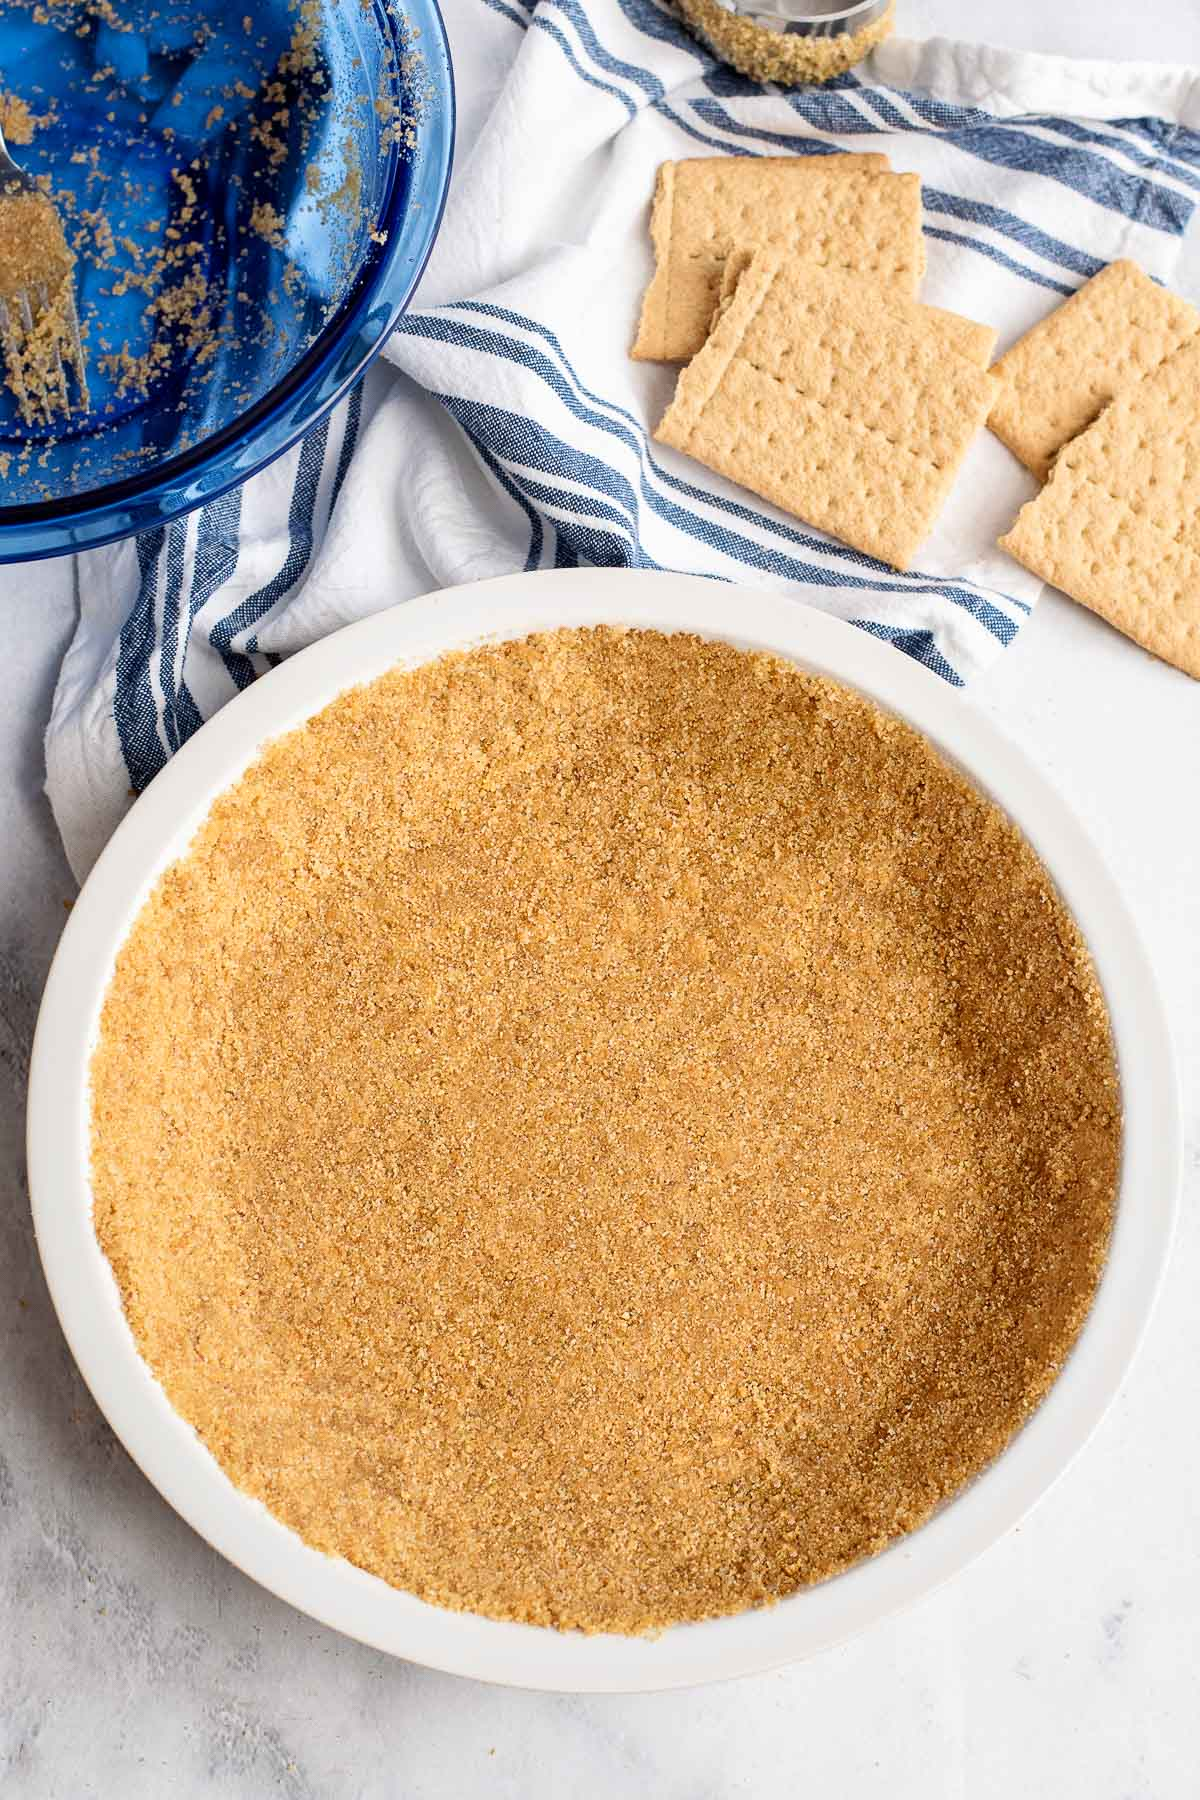 Graham cracker crust in pie plate